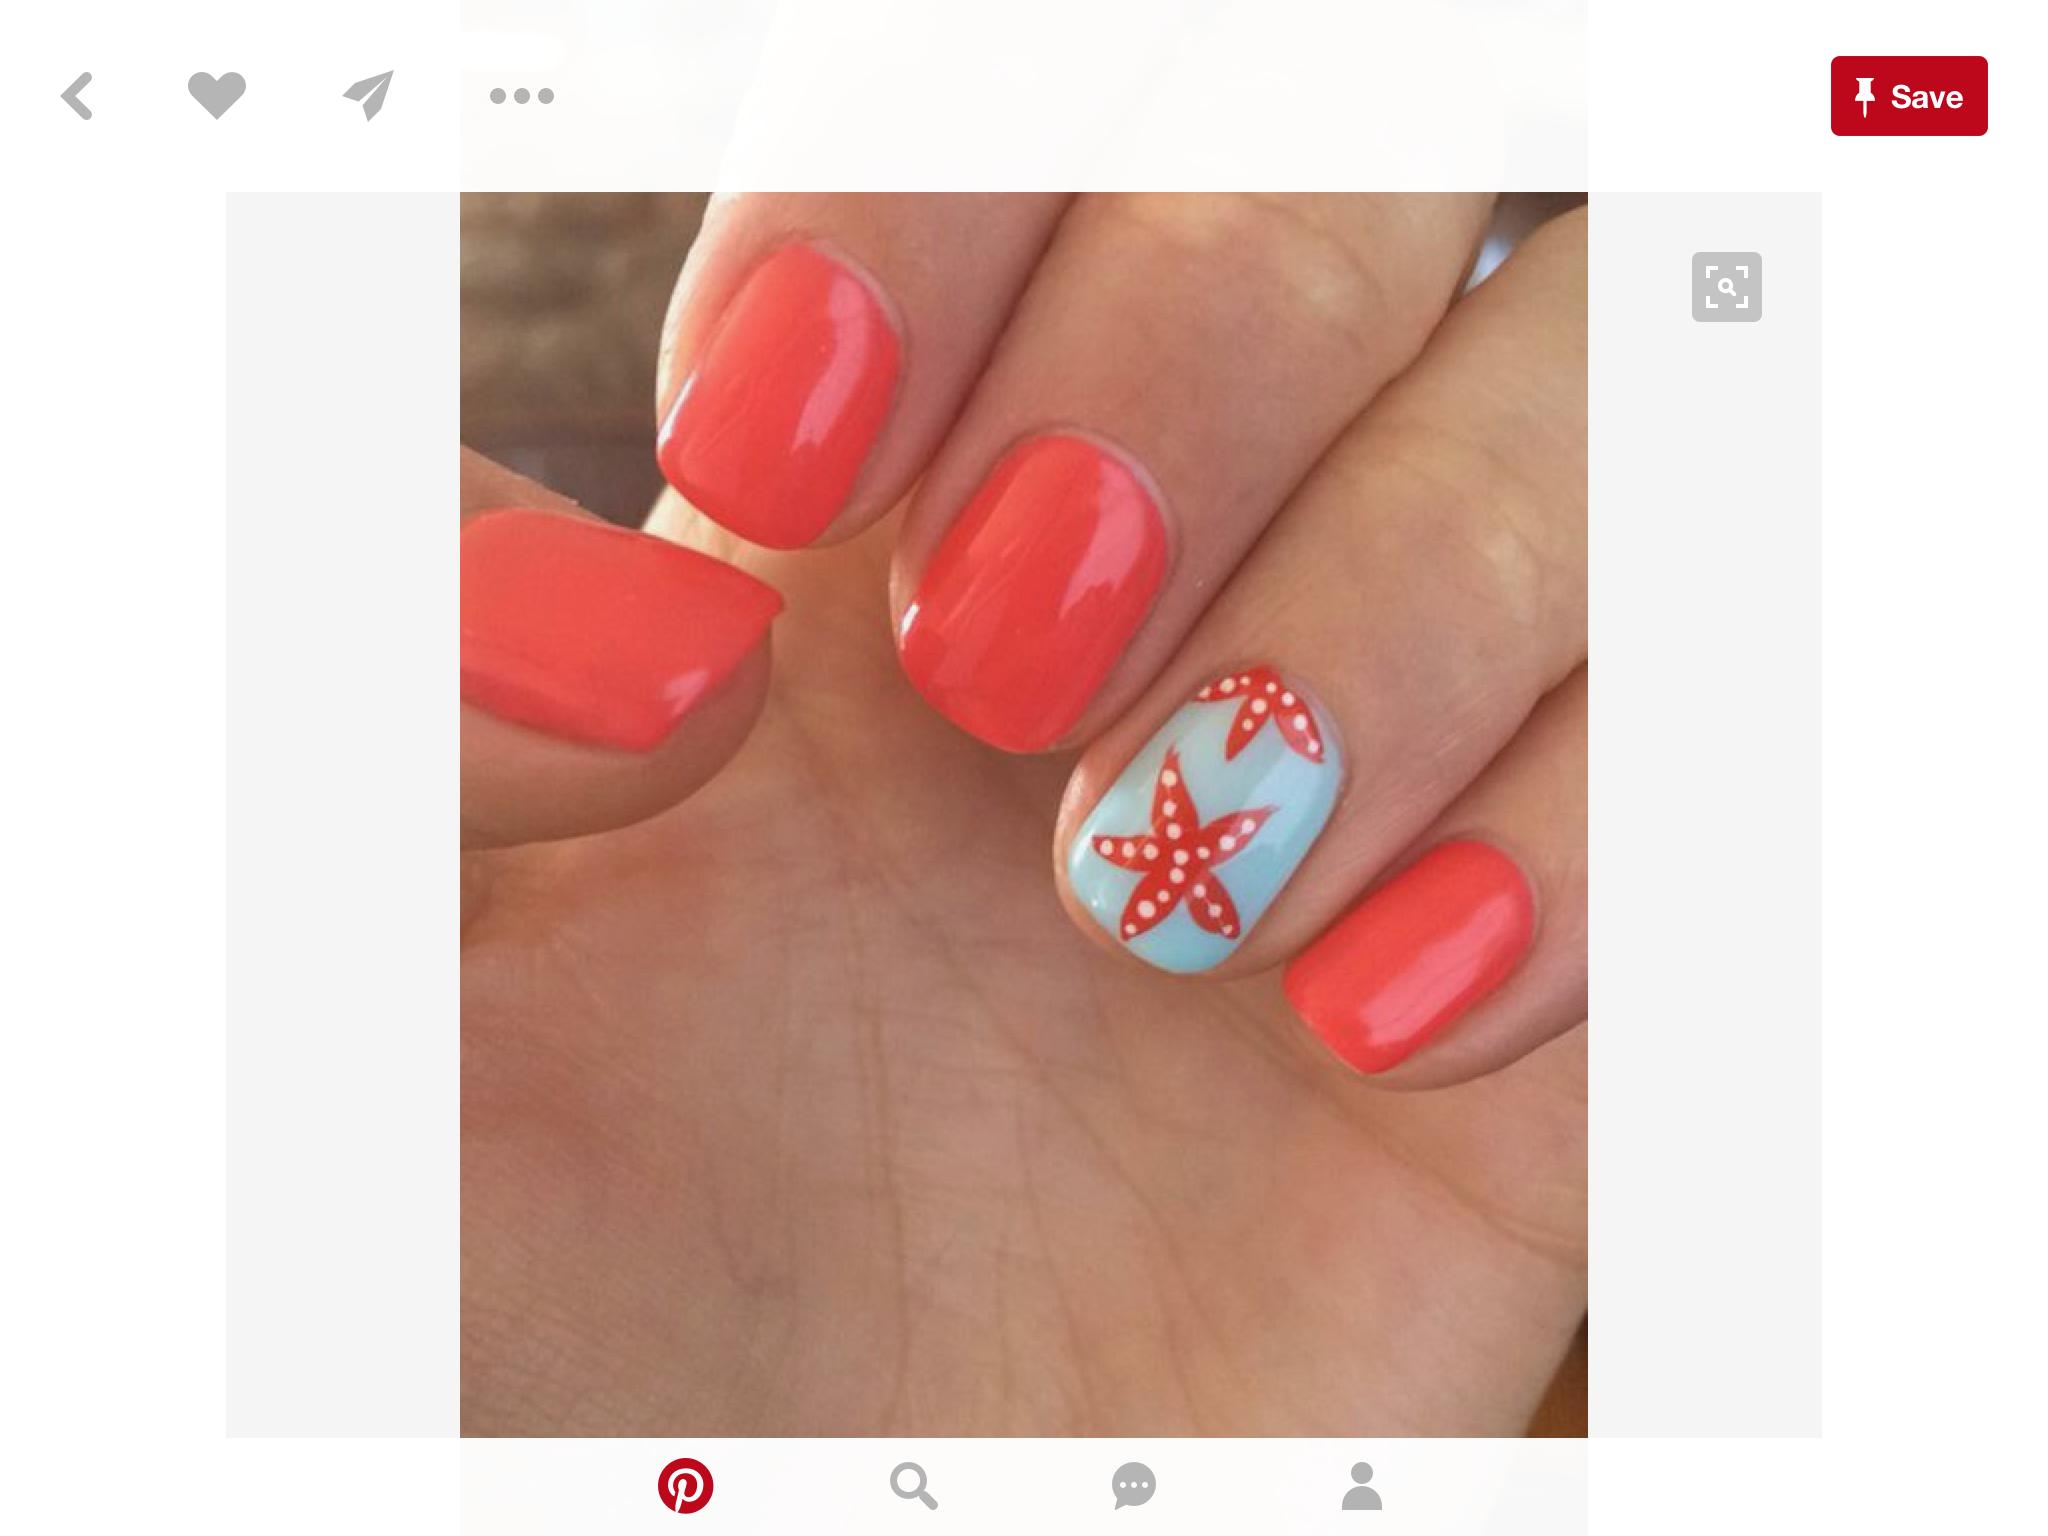 Elite Nails 20461 S Tamiami Trl, Estero, FL 33928 - YP.com